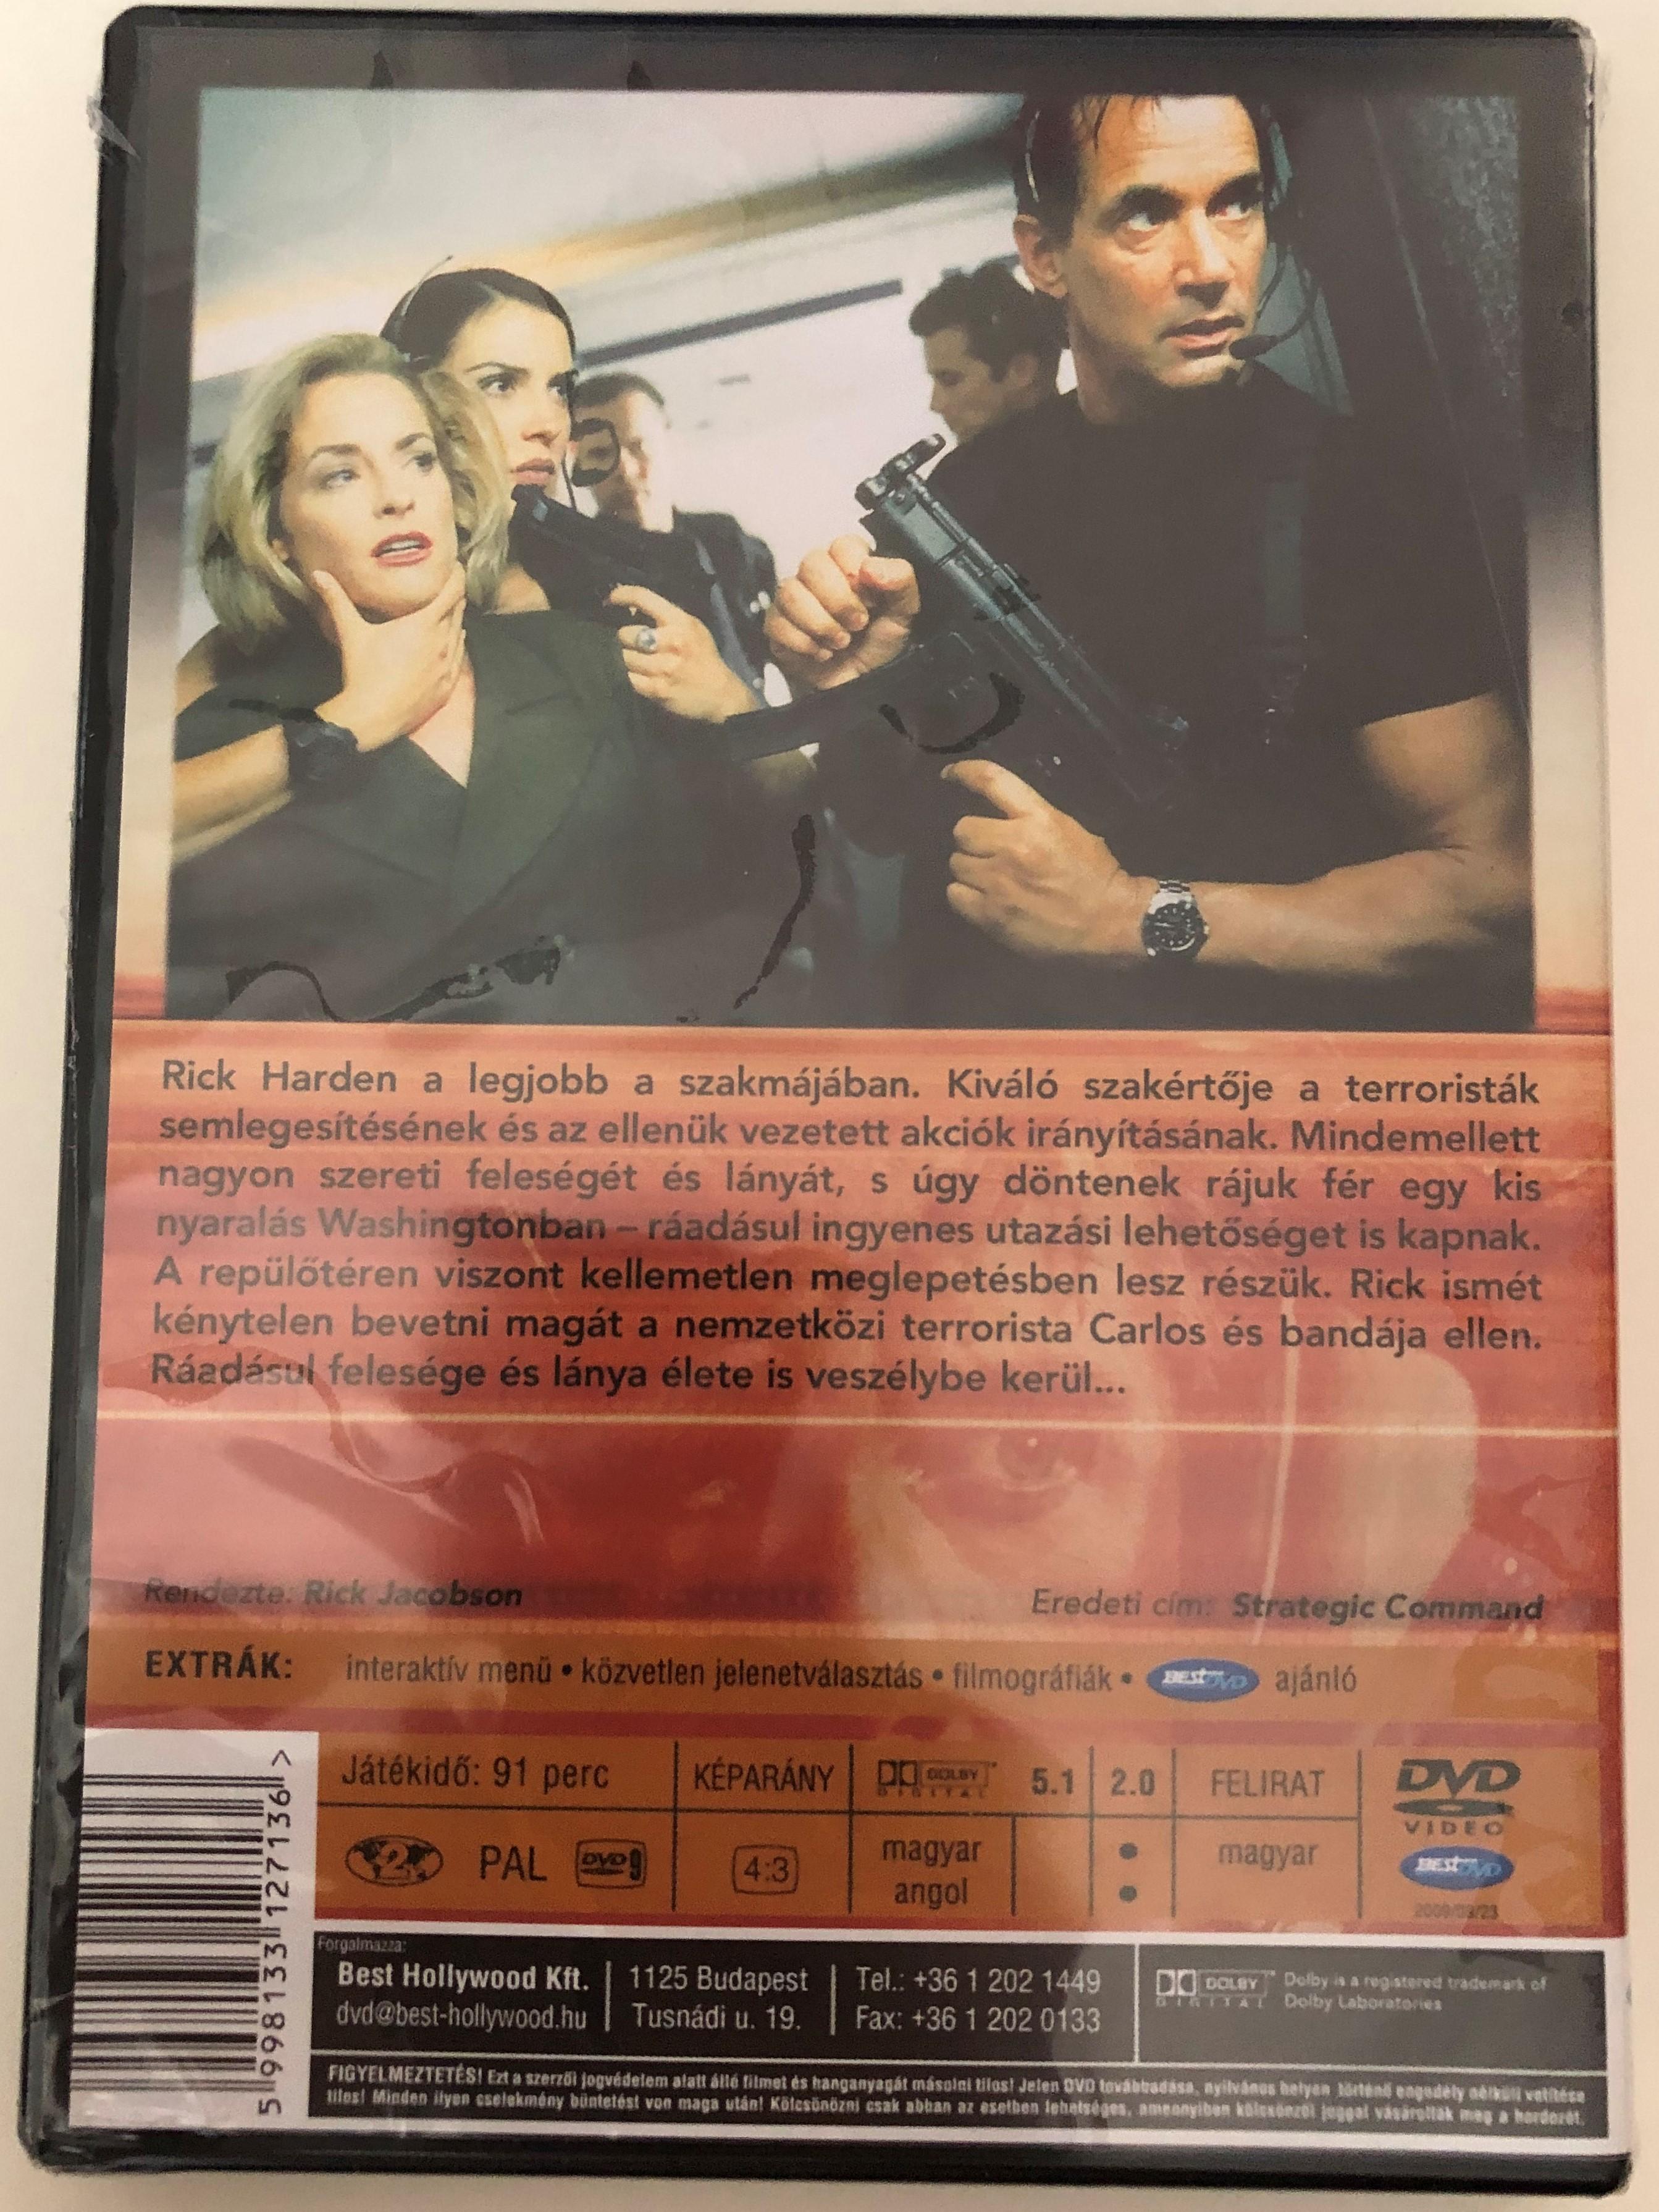 strategic-command-dvd-1997-bevet-si-parancs-2.jpg